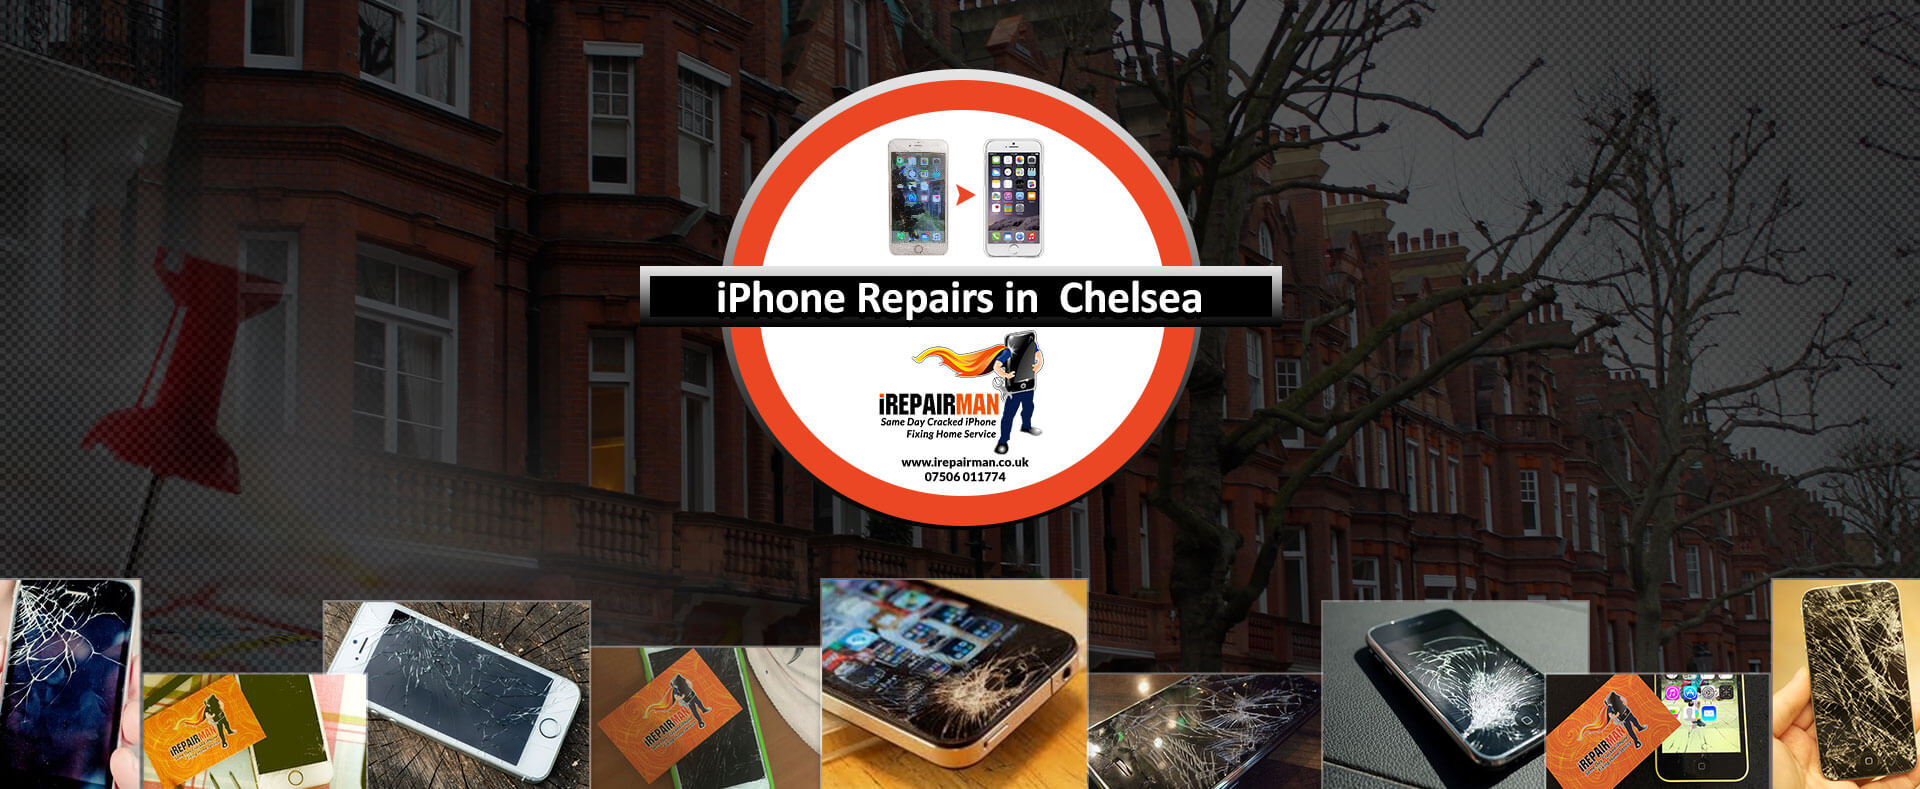 iPhone Repairs in Chelsea